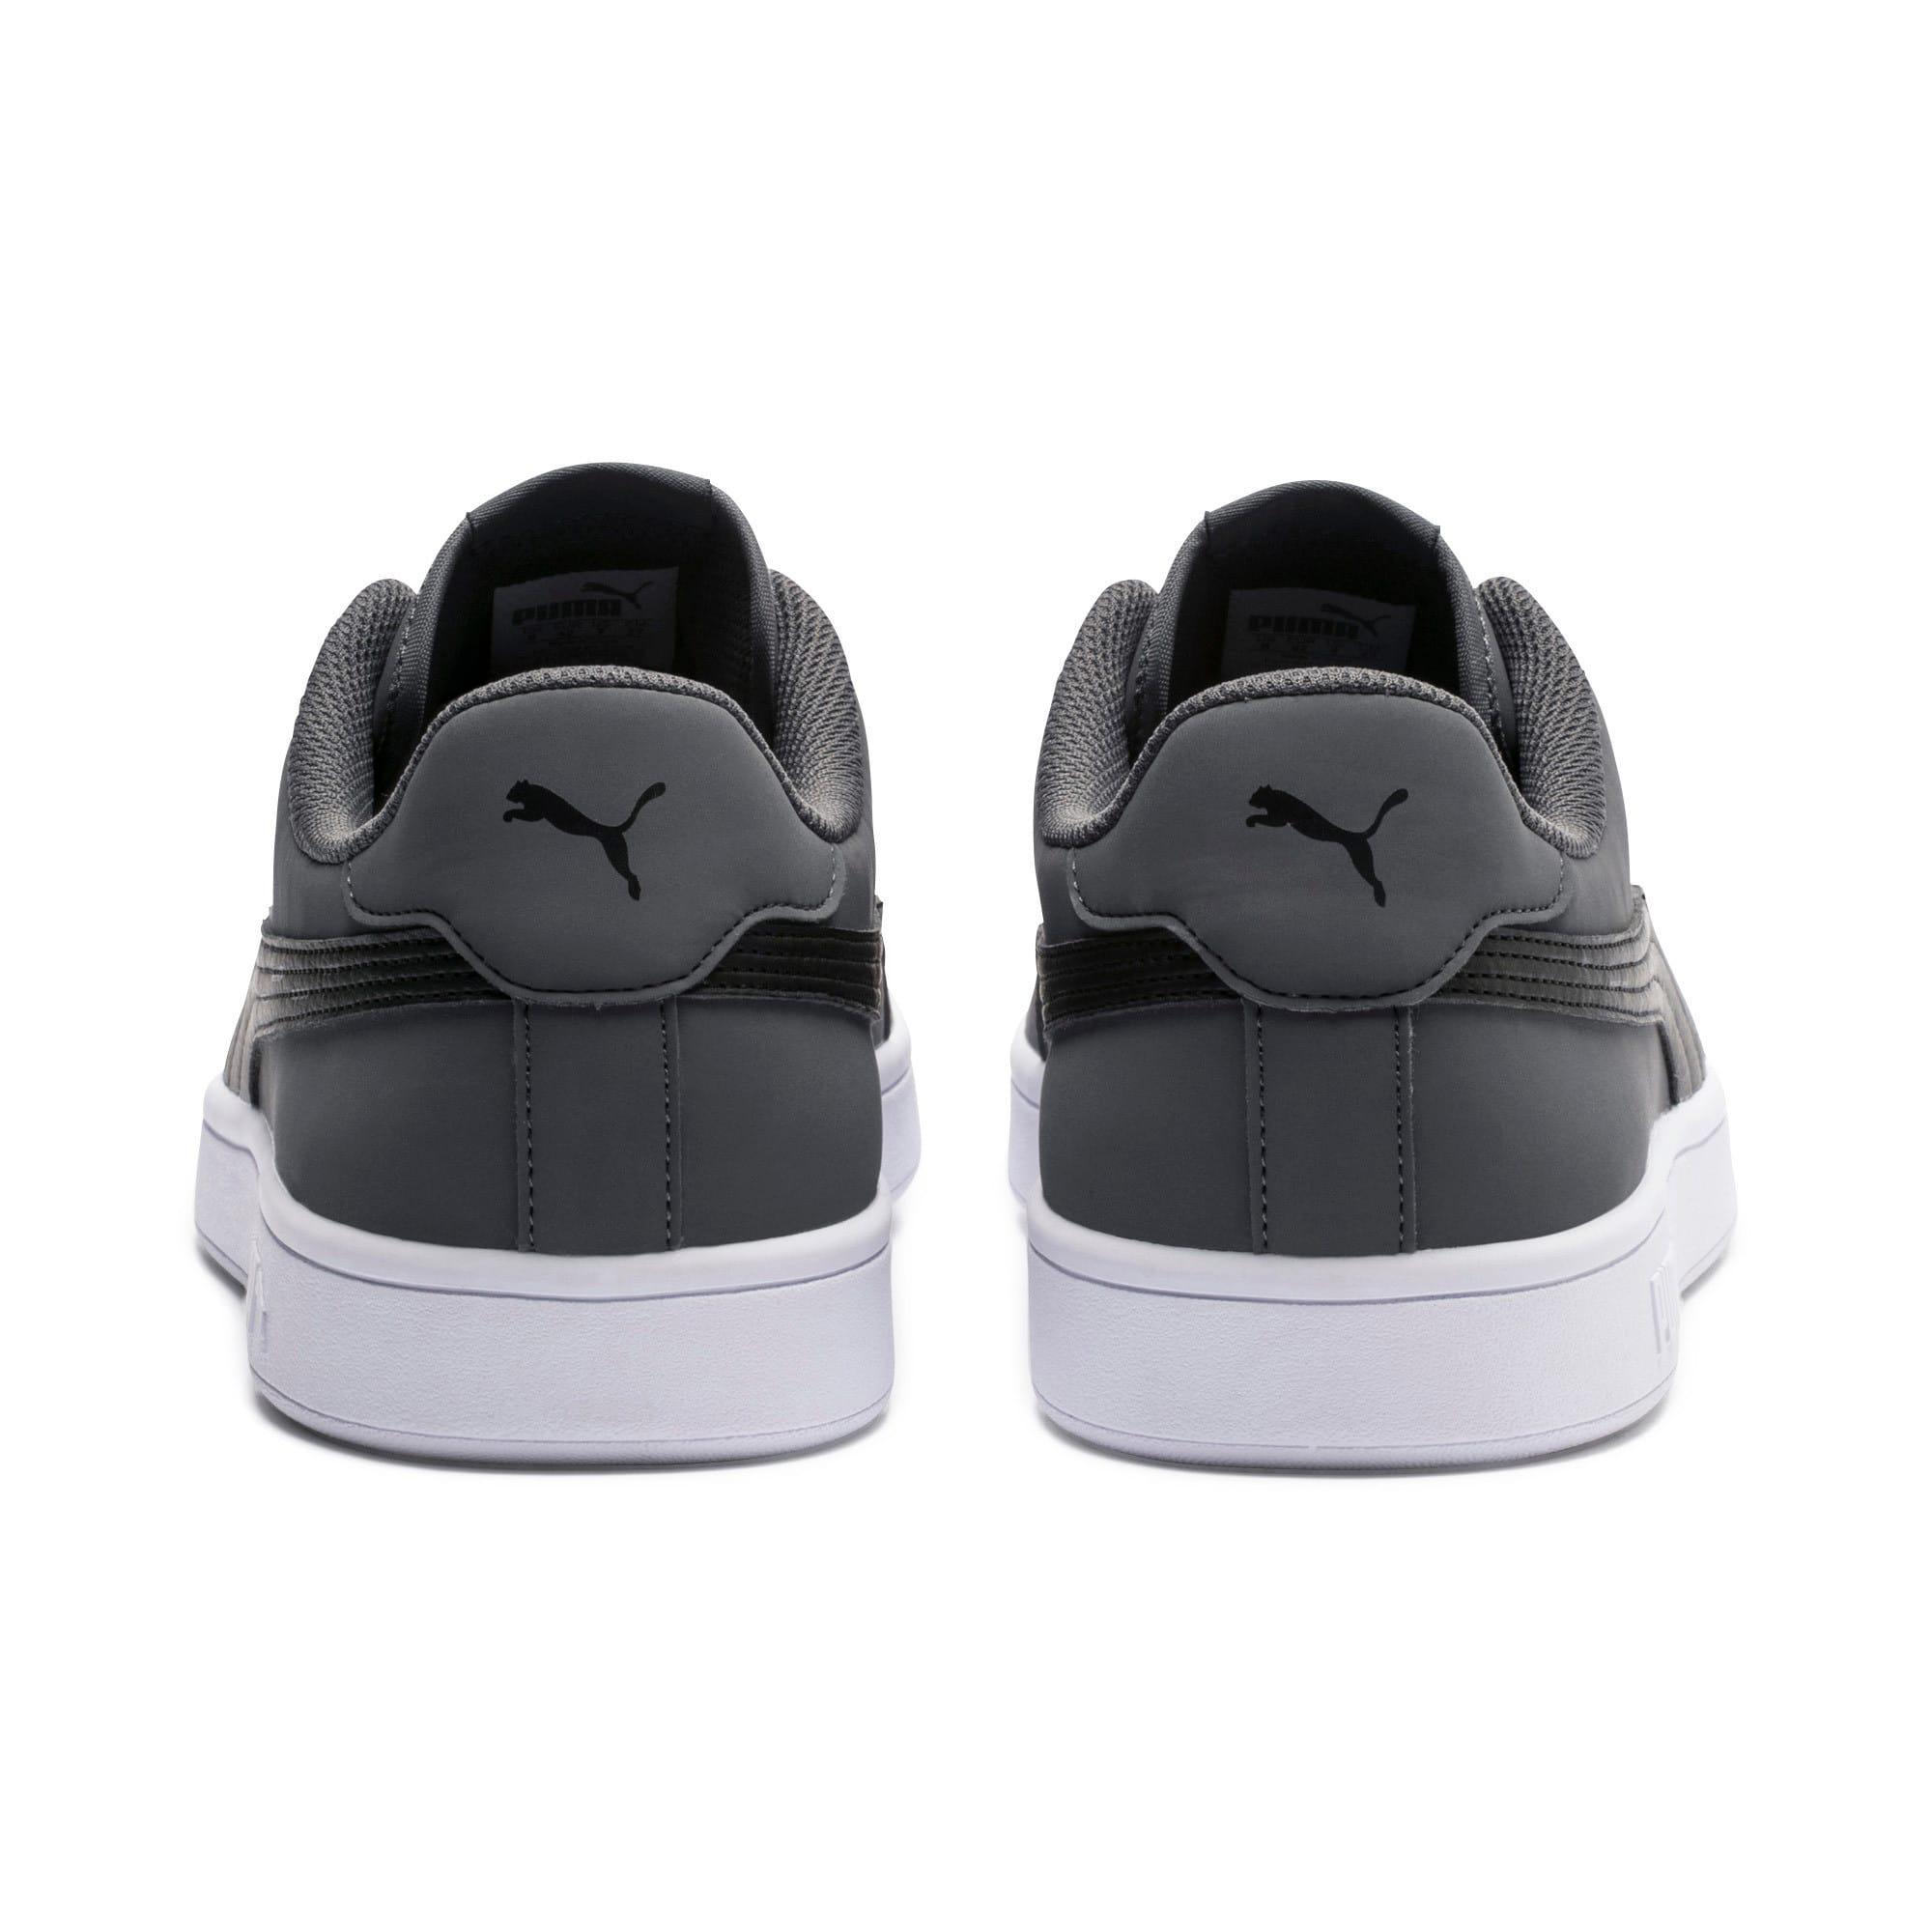 Details about PUMA PUMA Smash V2 Buck Sneakers Men Shoe Basics